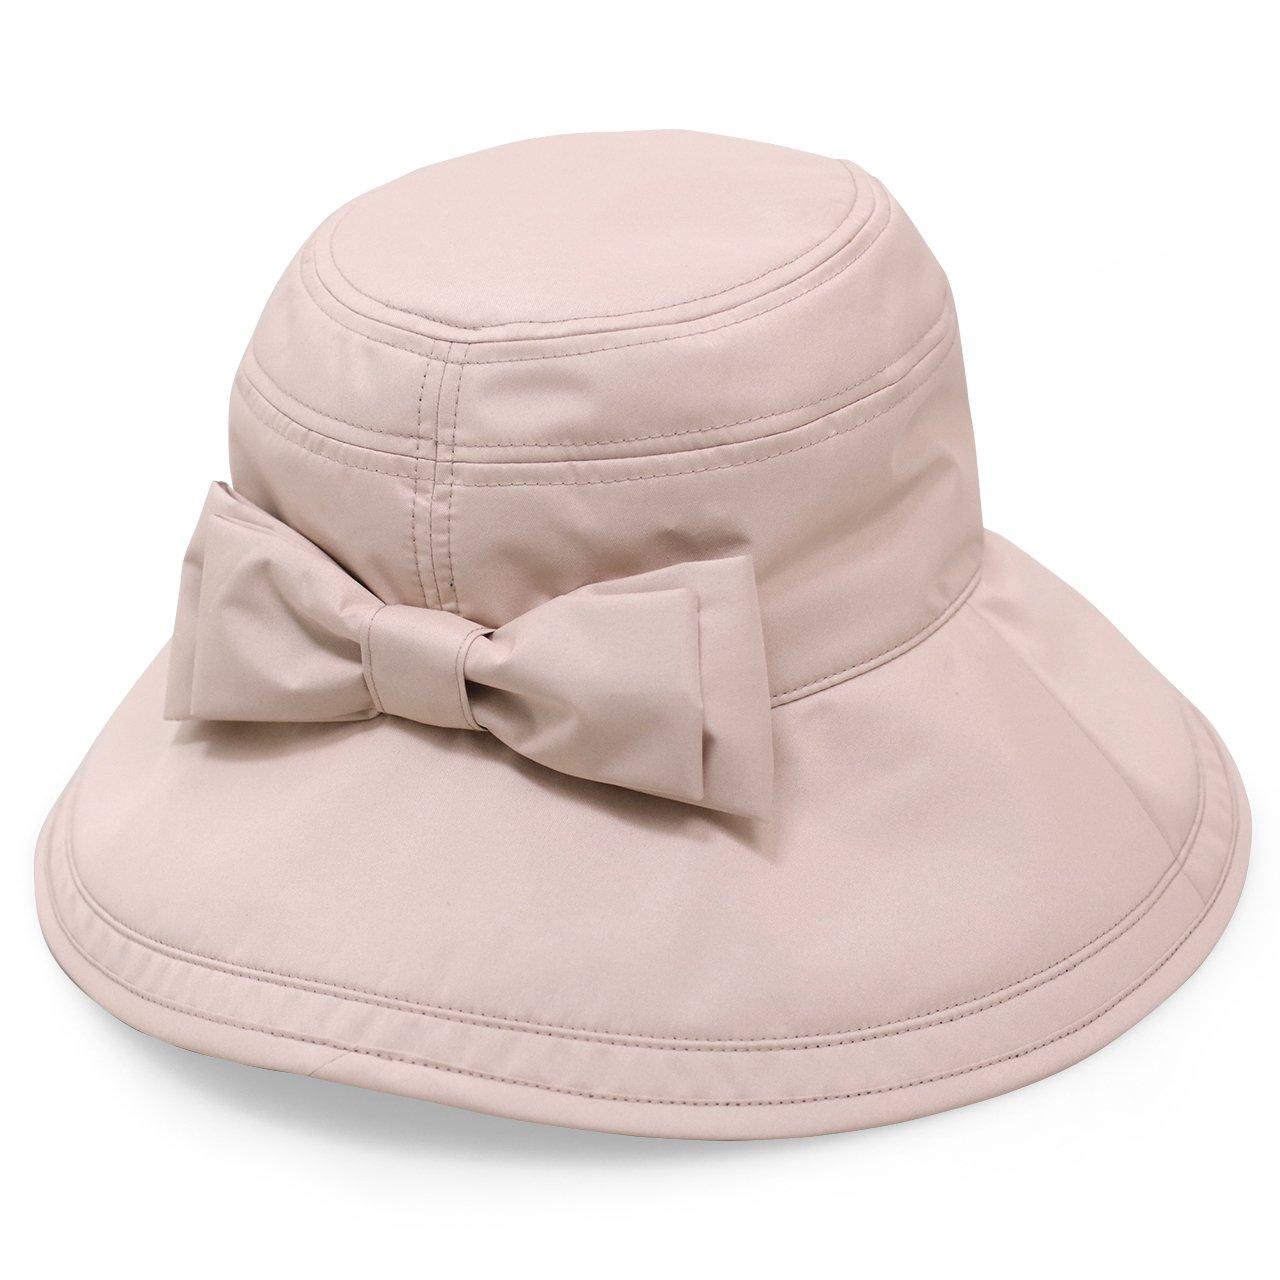 Rose Blanc(ロサブラン) 100%完全遮光 帽子 リボンハット12cm(ポケット付) B06XDH8FBK Pink(ピンク) Pink(ピンク)